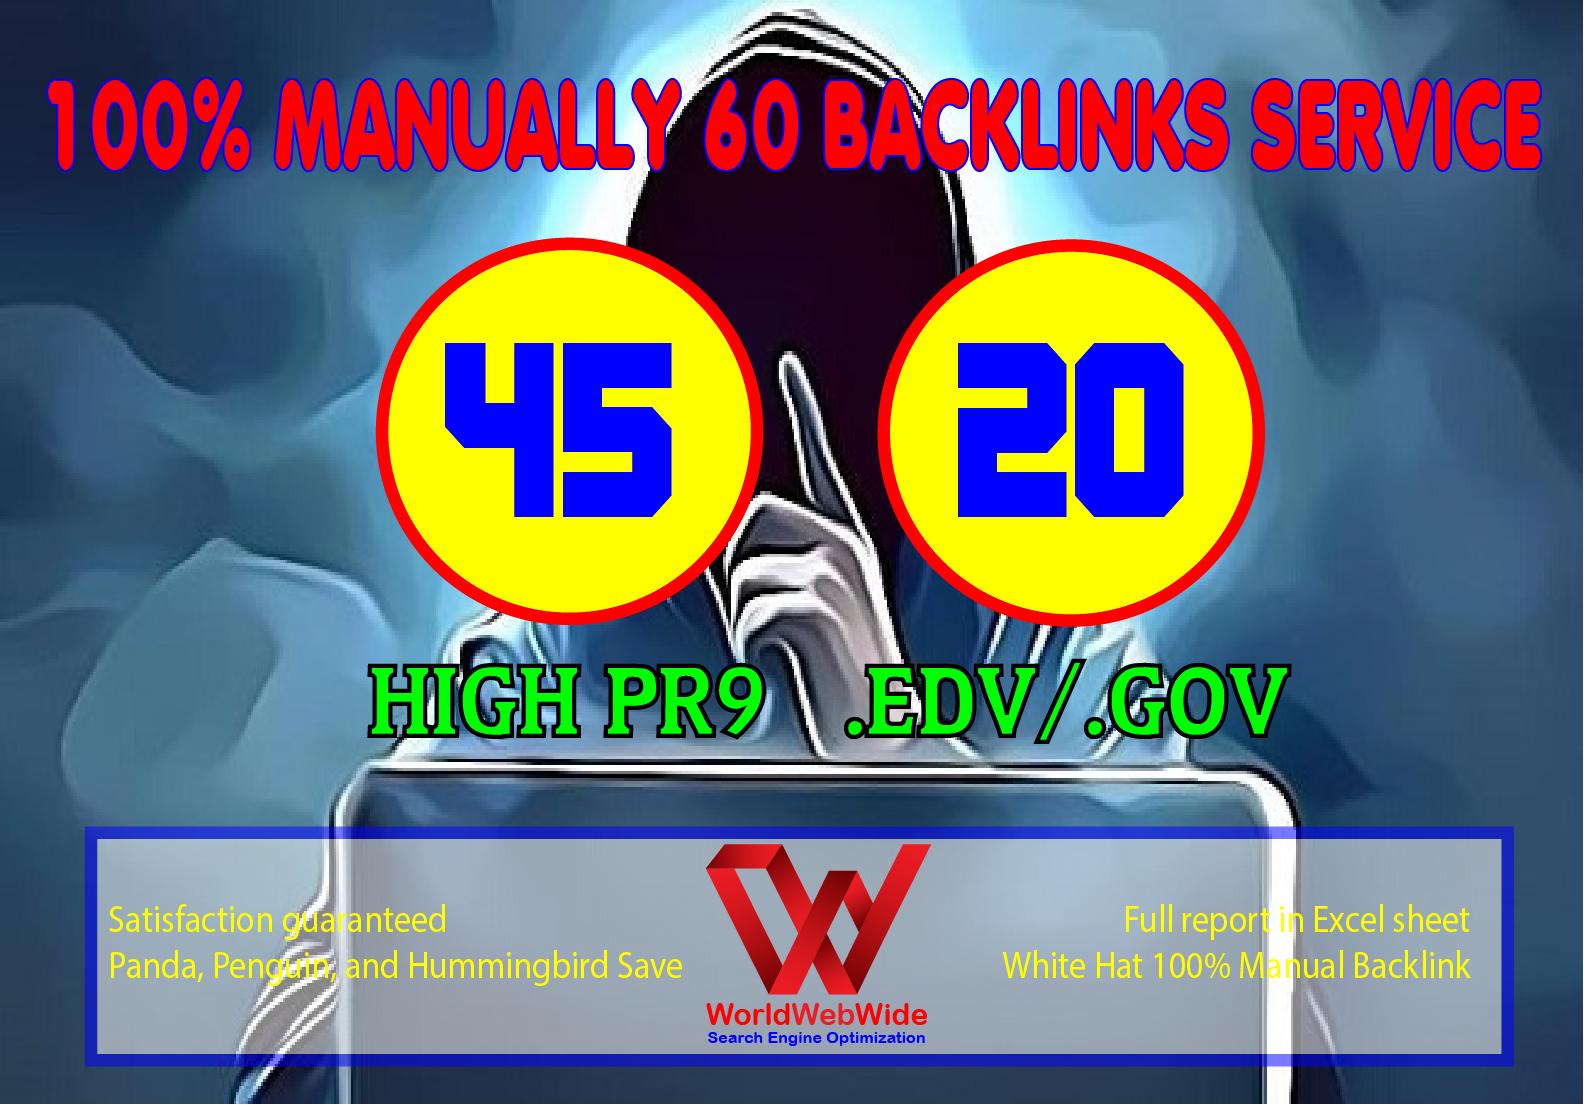 Create 45+ PR9 to PR7 + 20+. Edu/. Gov Safe SEO Backlinks High Authority Site to Boost Your Google